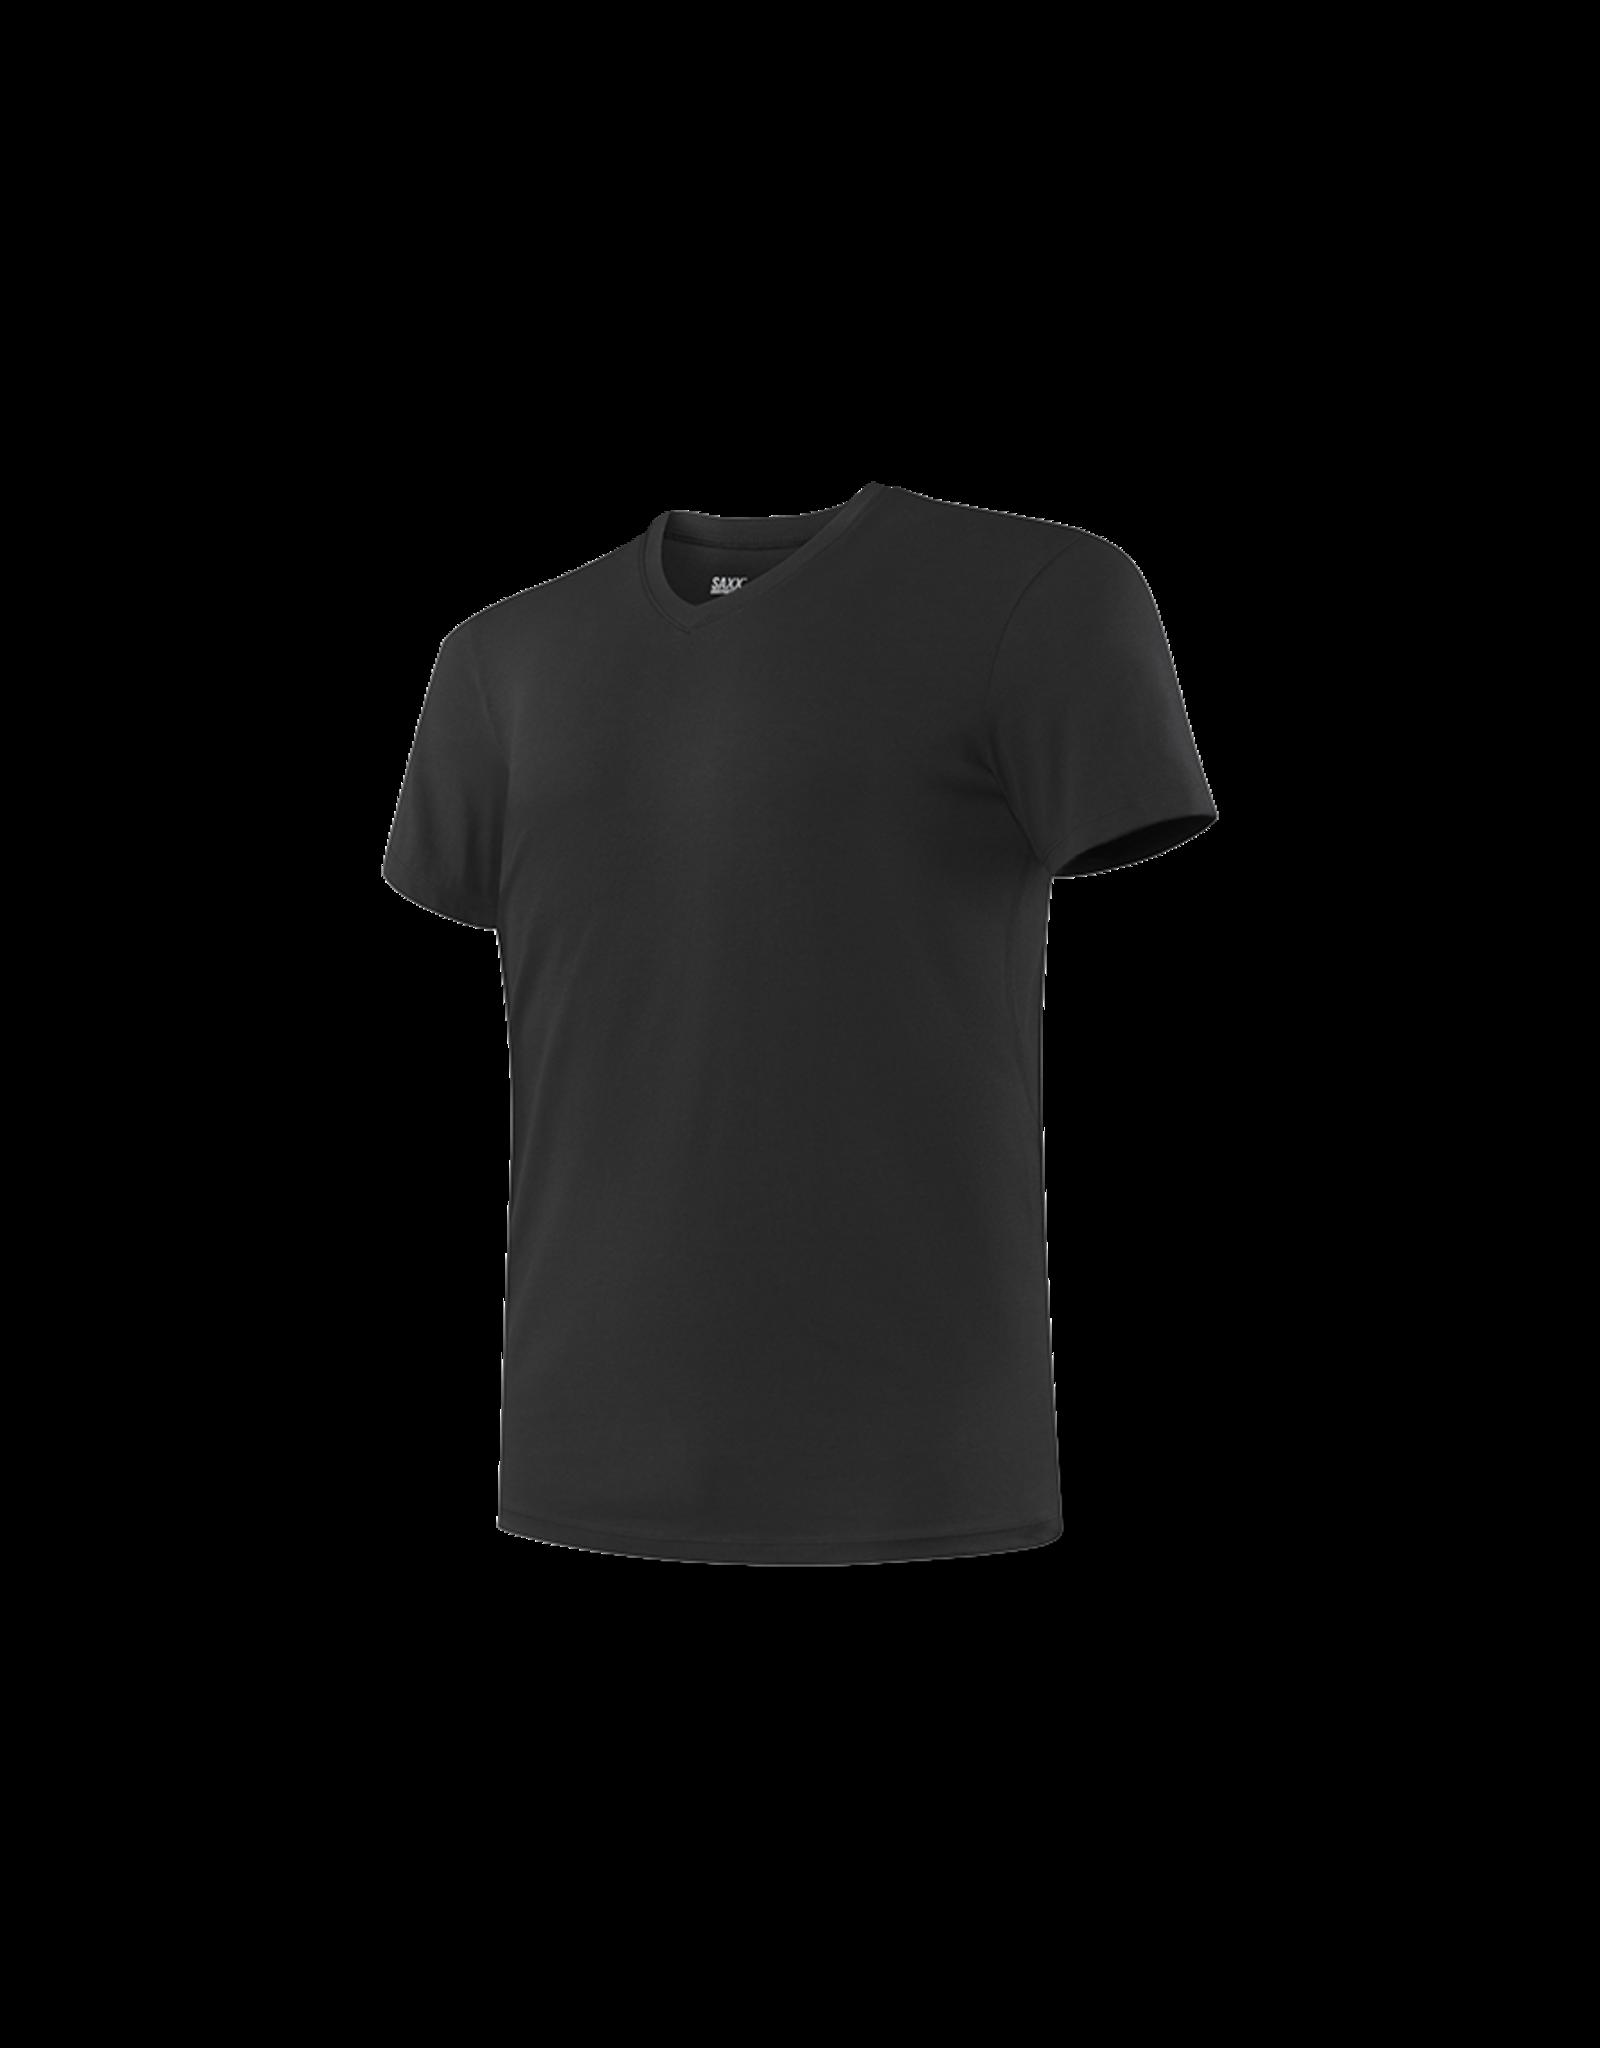 Saxx Undercover Short Sleeve V-Neck T-shirt